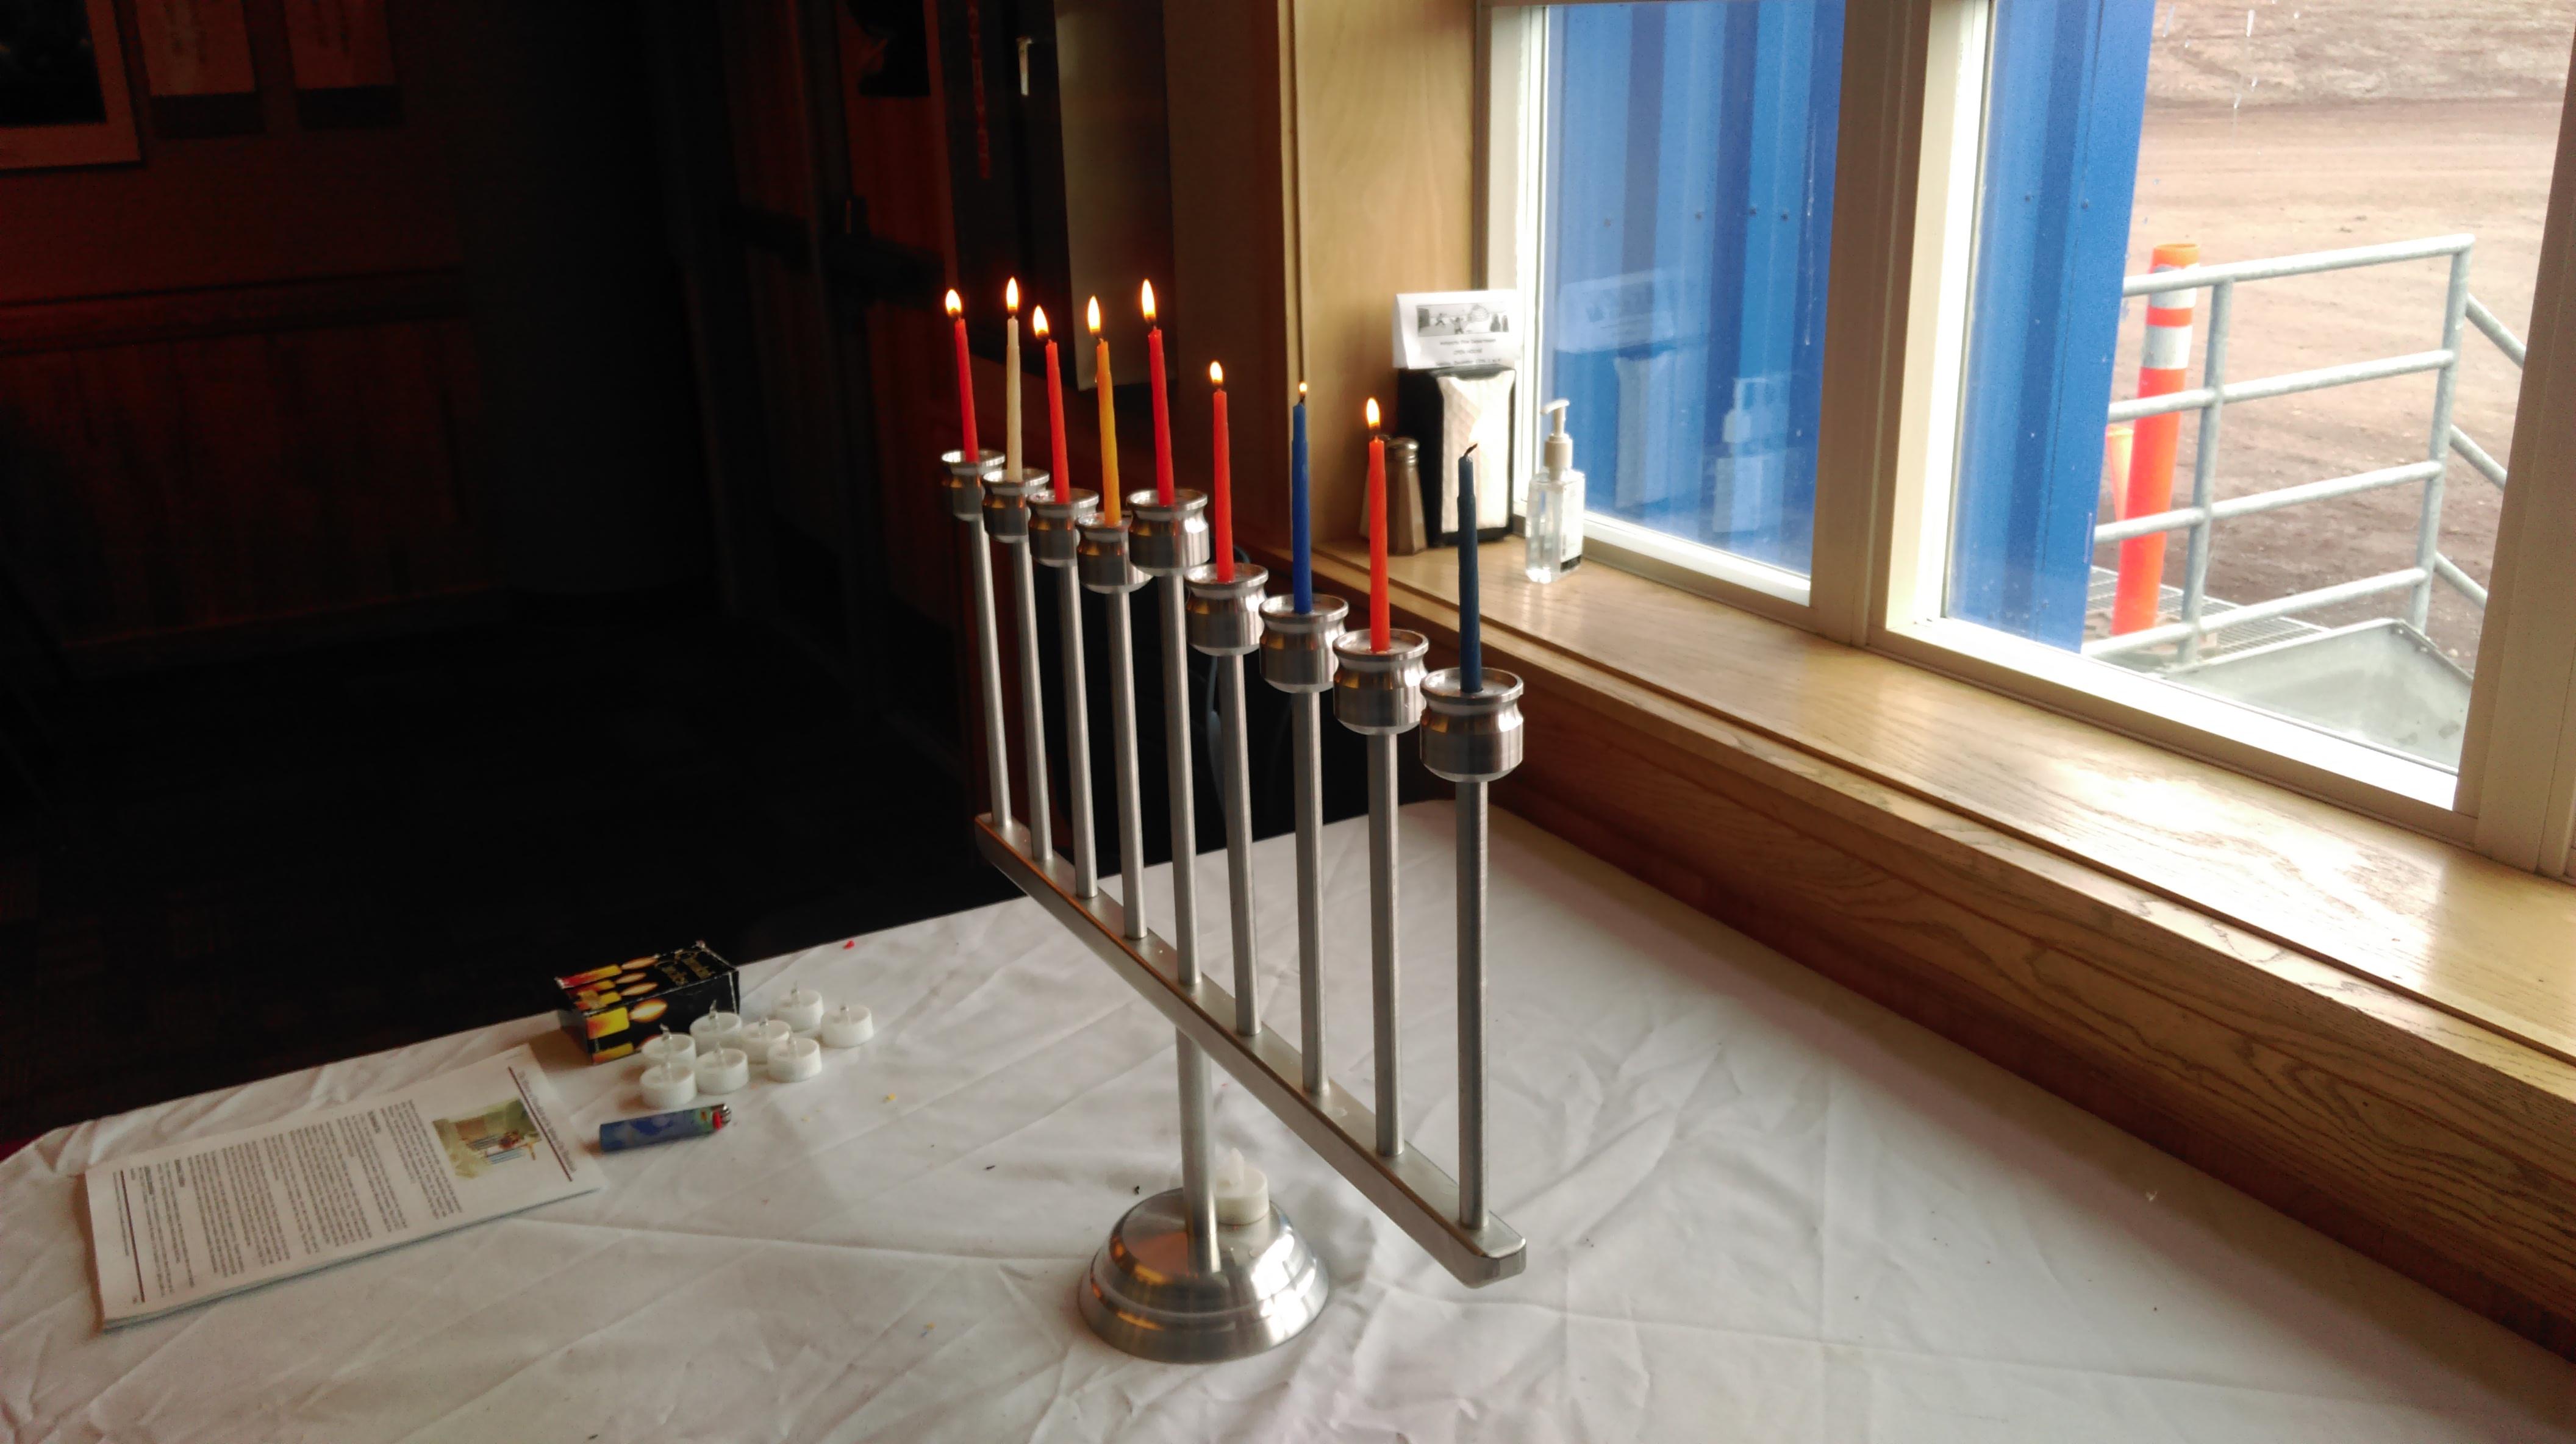 last night of hanukkah 2019 - HD4224×2368